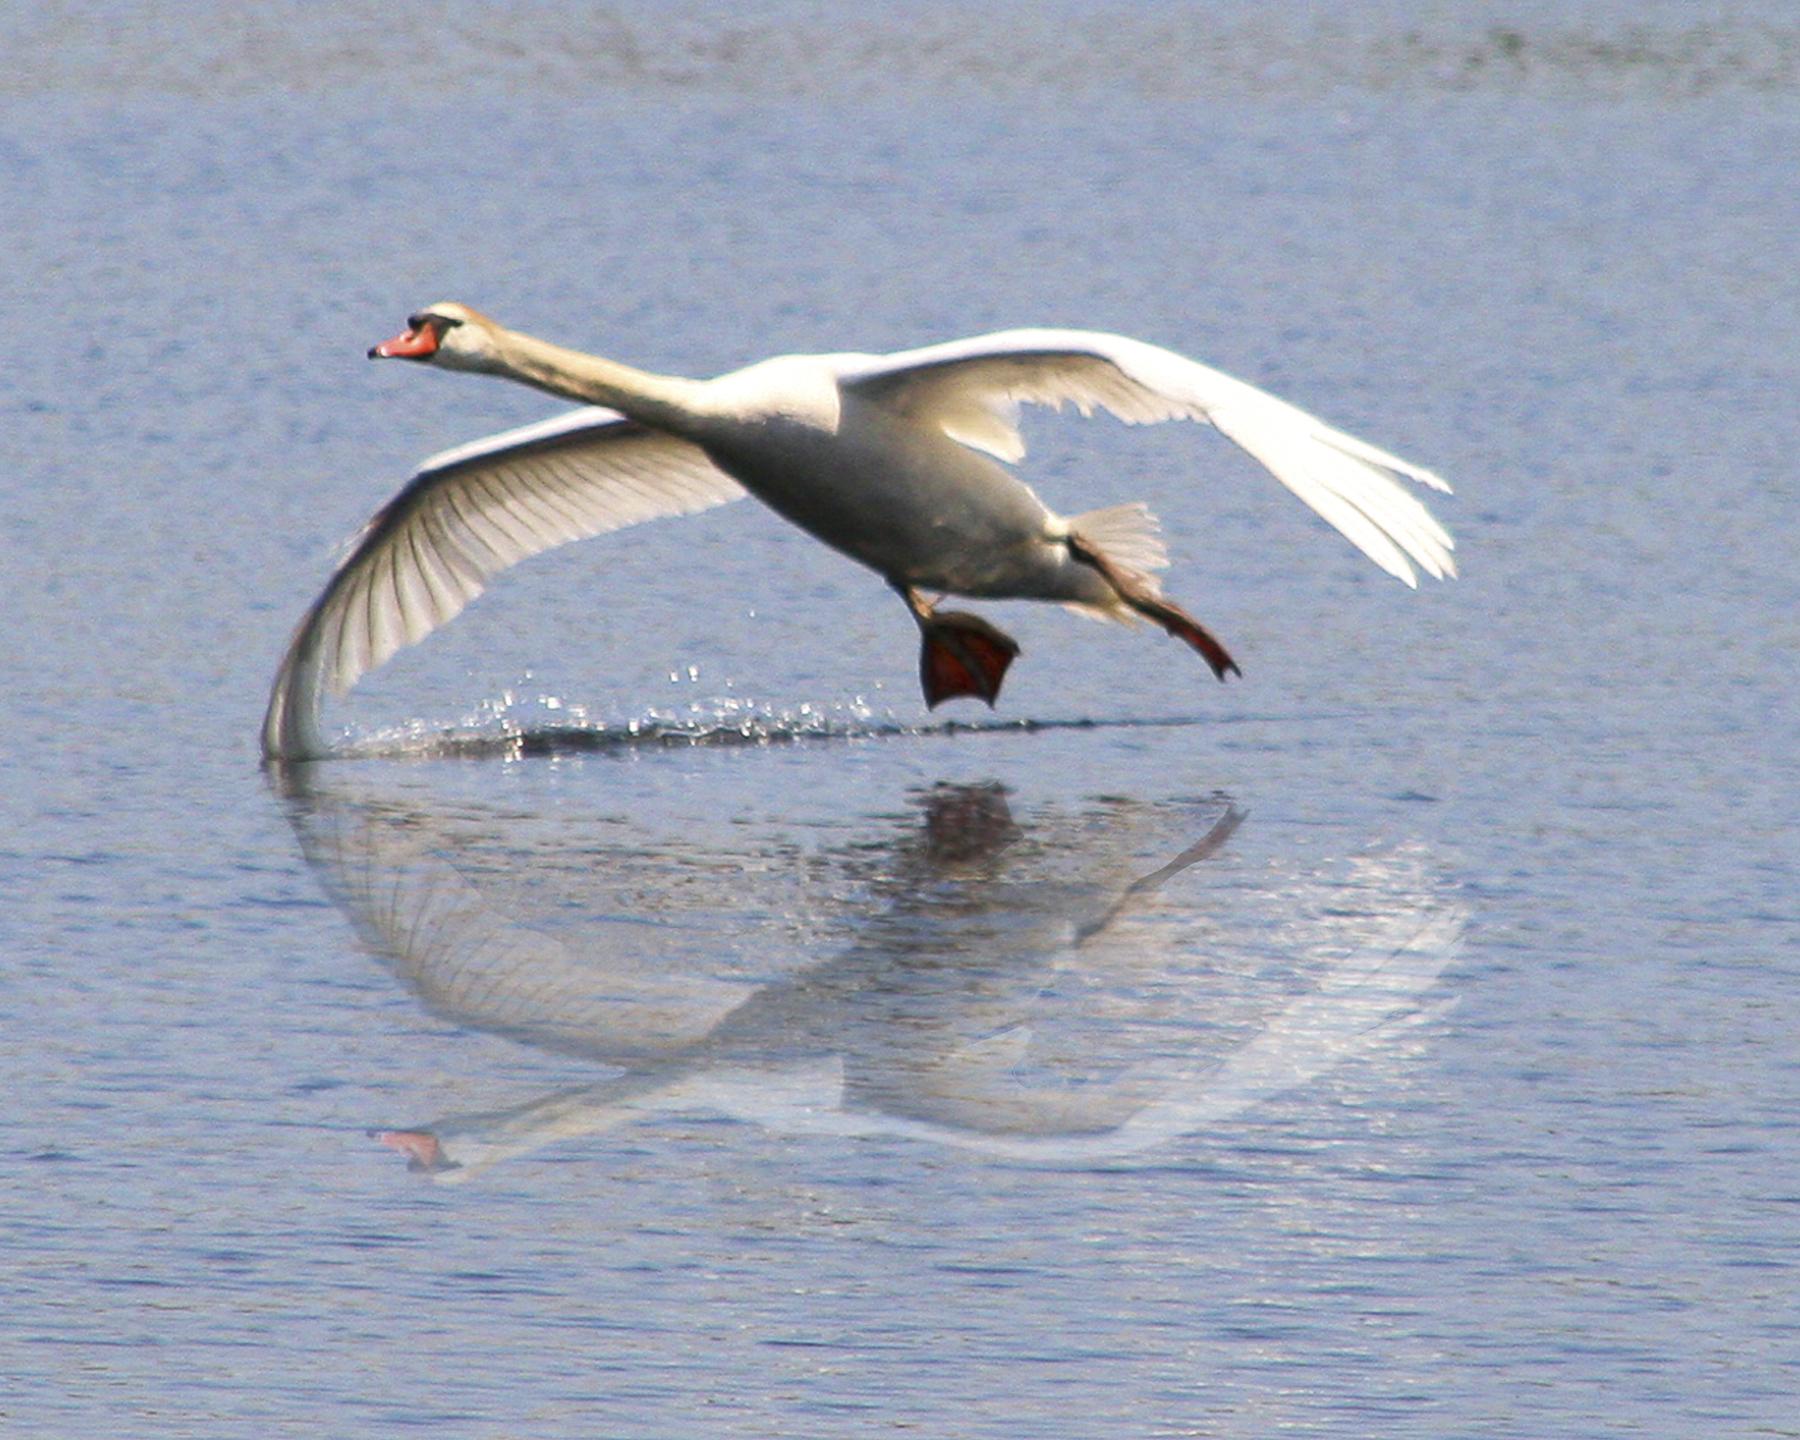 ed 275 swan wing in water IMG8x10 nik v reflection_4704.jpg